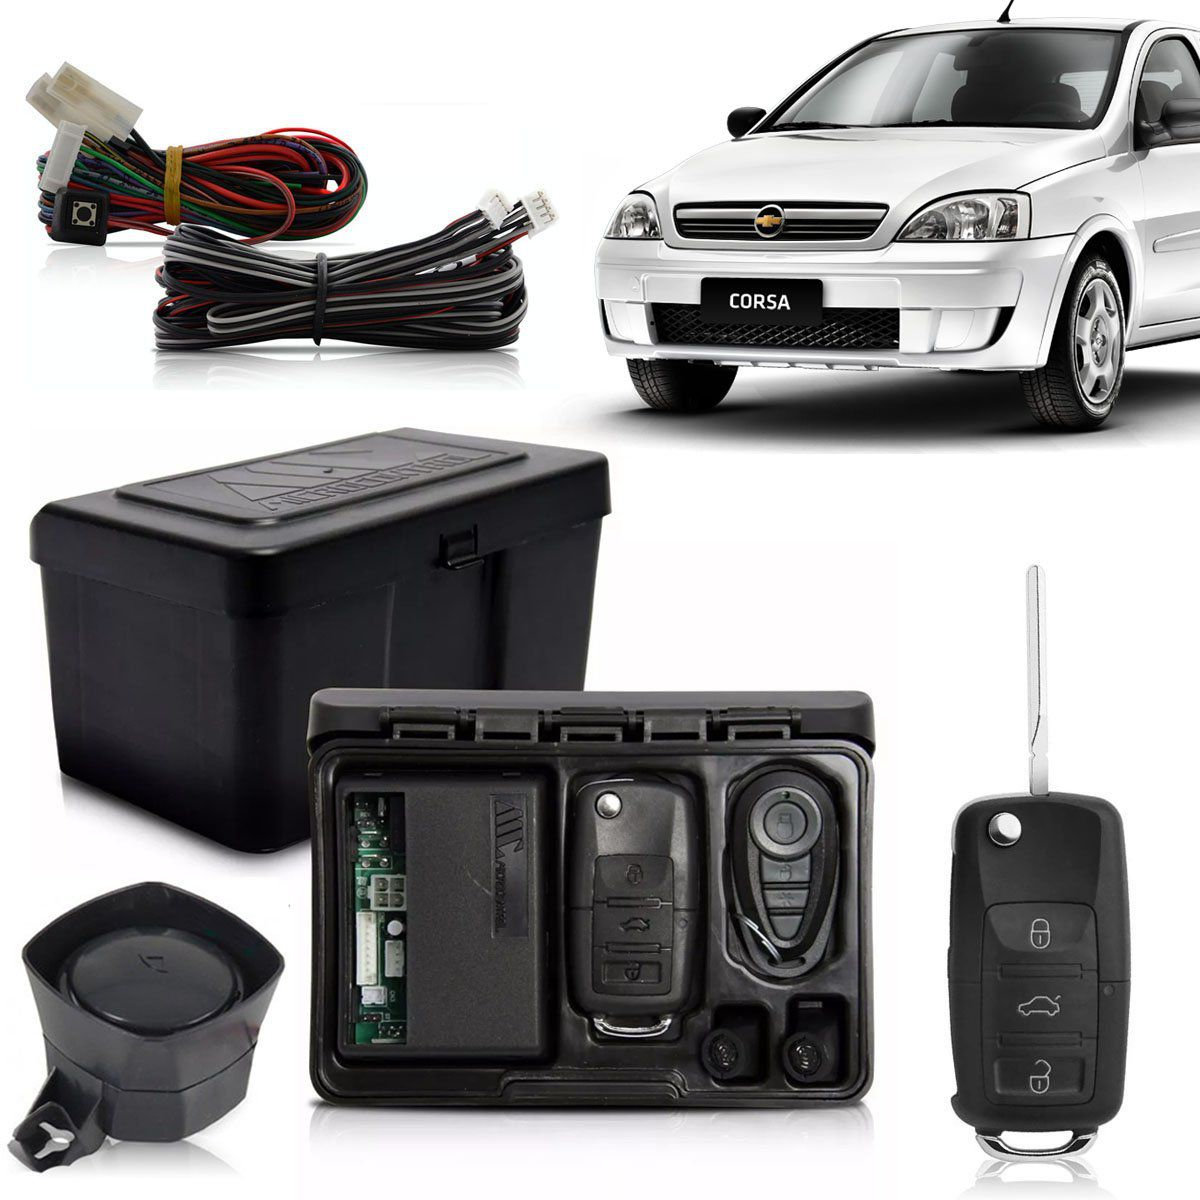 Alarme Automotivo Bloqueador Anti-furto Chave Canivete Corsa Sedan 2003 Até 2015